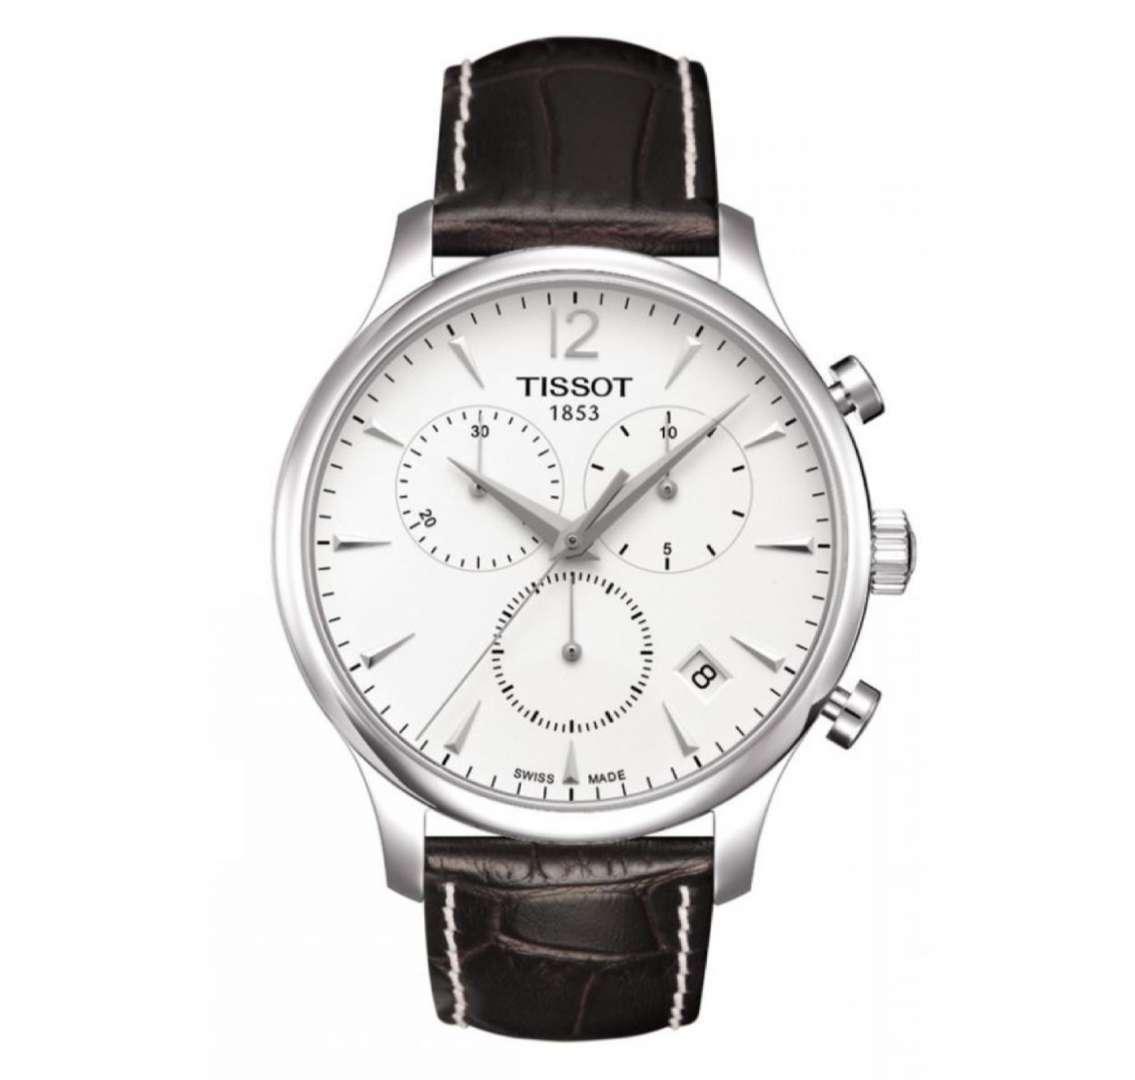 שעון יד אנלוגי tissot t063.617.16.037.00 טיסו